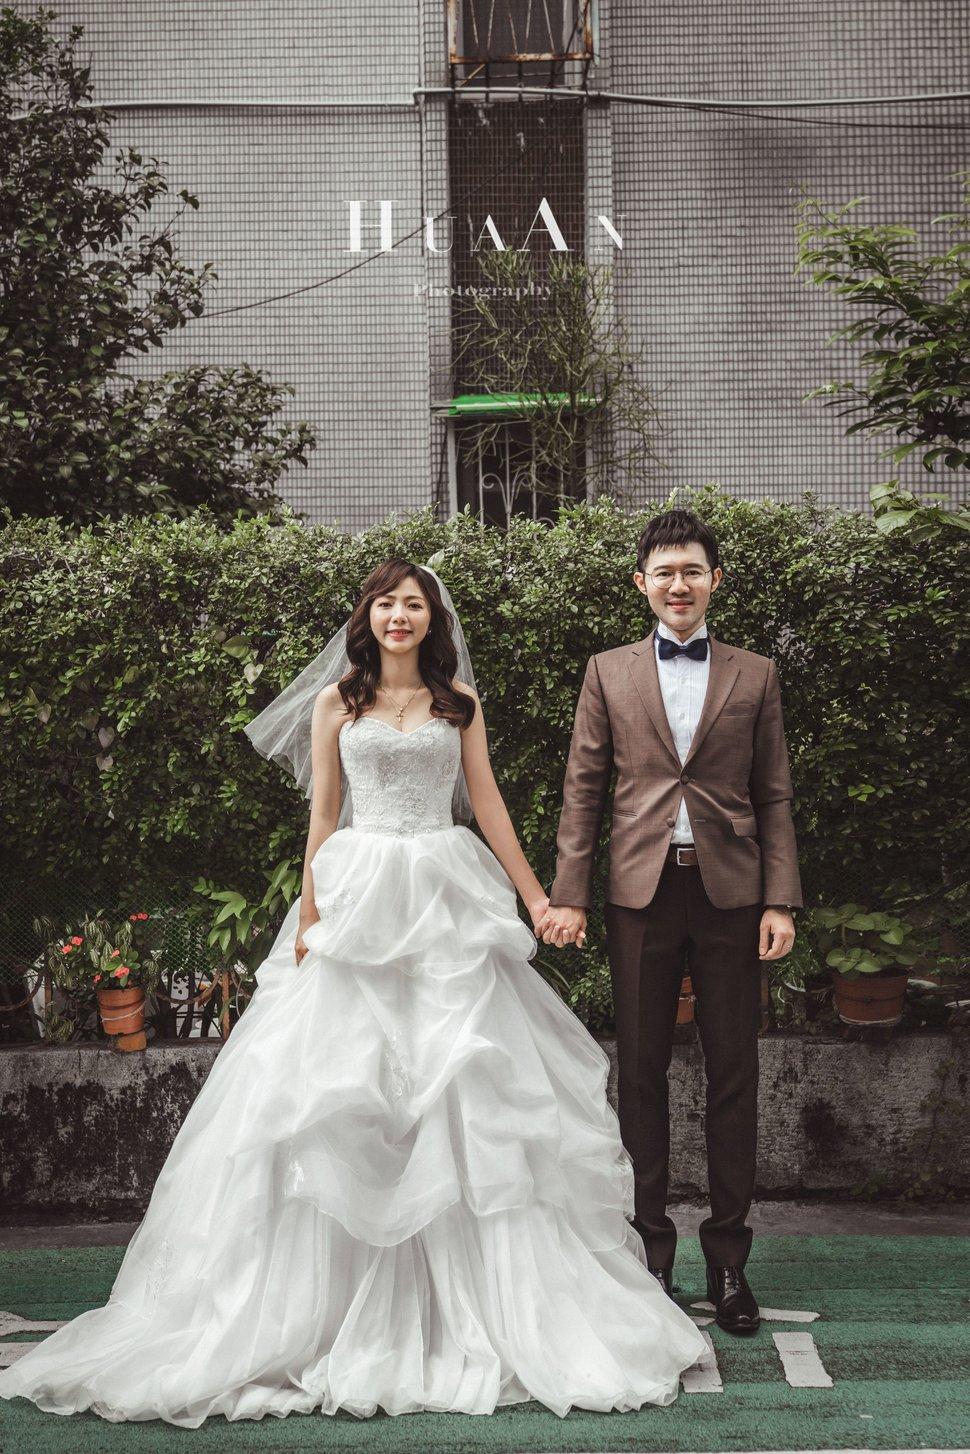 HUA00805 - Huaan Photography《結婚吧》